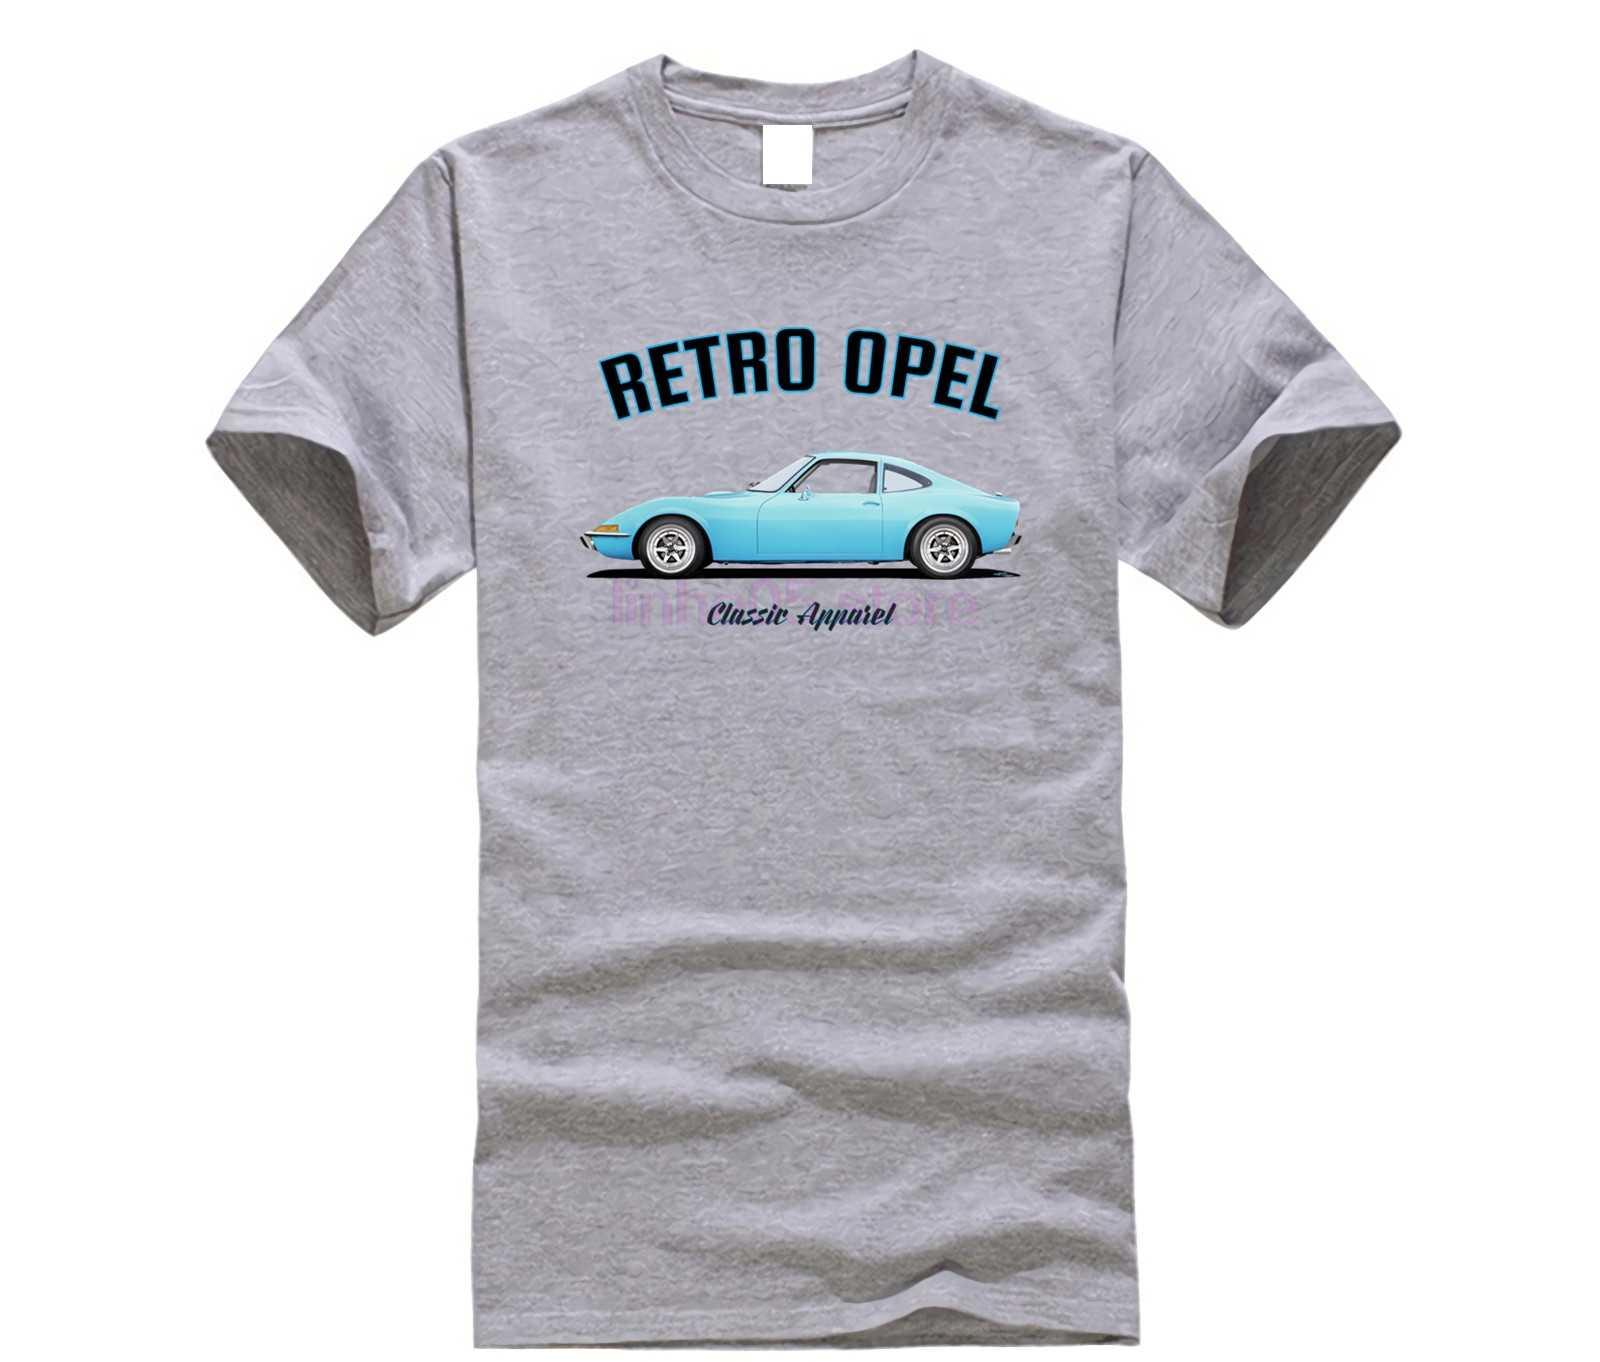 d06464efbdd08f 2019 New Fashion Brand In Fashion Cotton Teeshirt German Classic Car Fansl  Gt T-Shirt